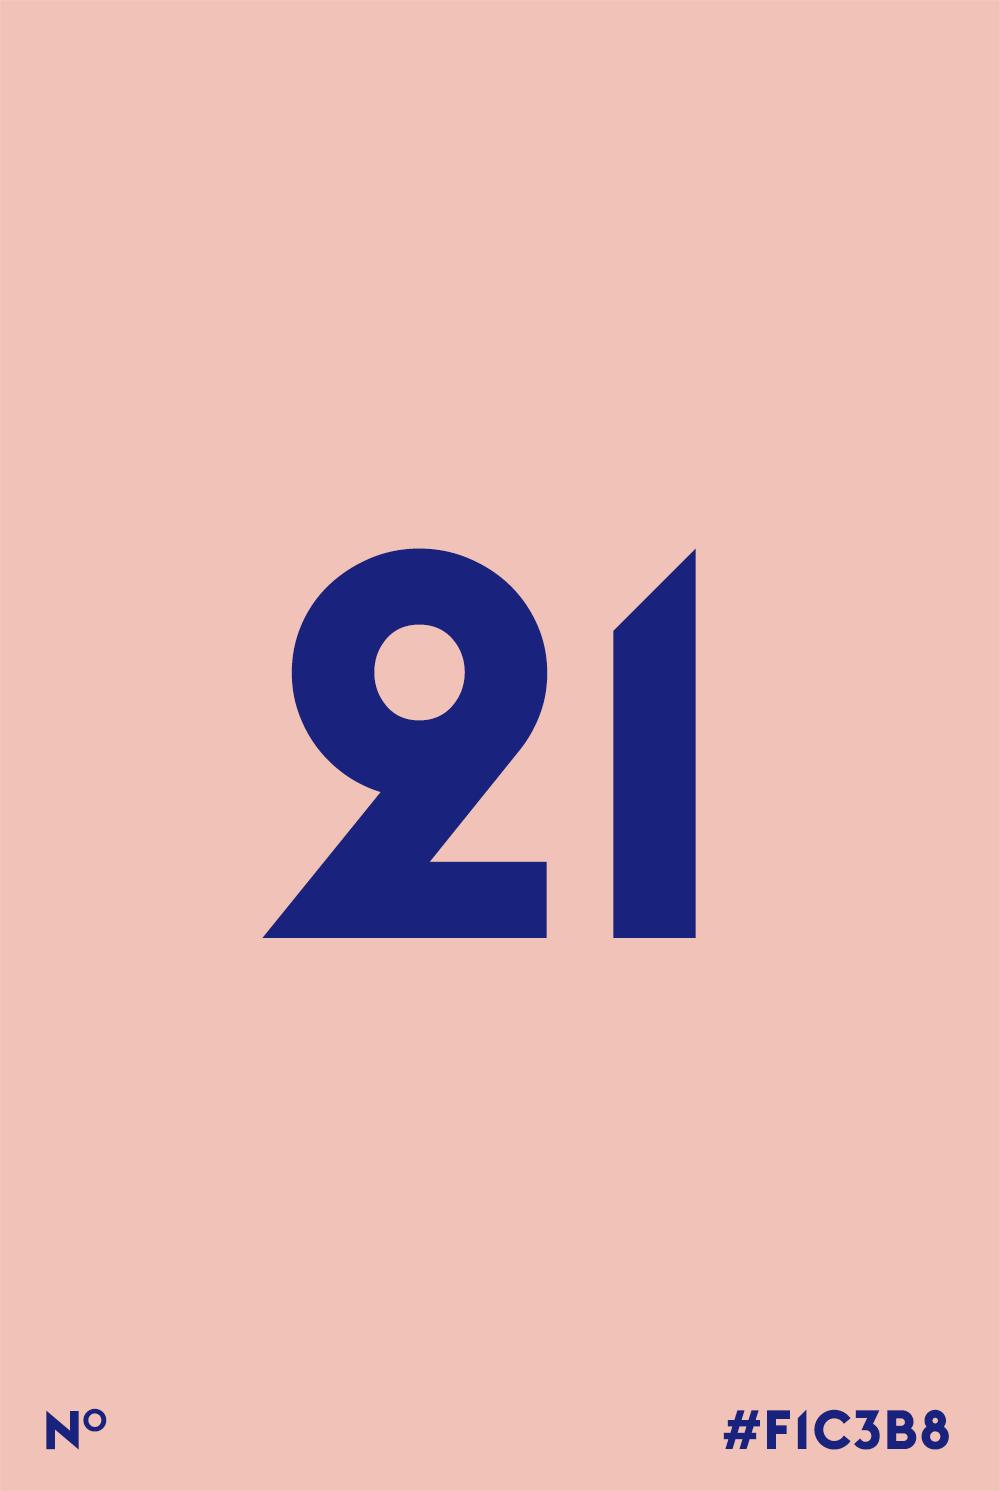 cc_0020_21